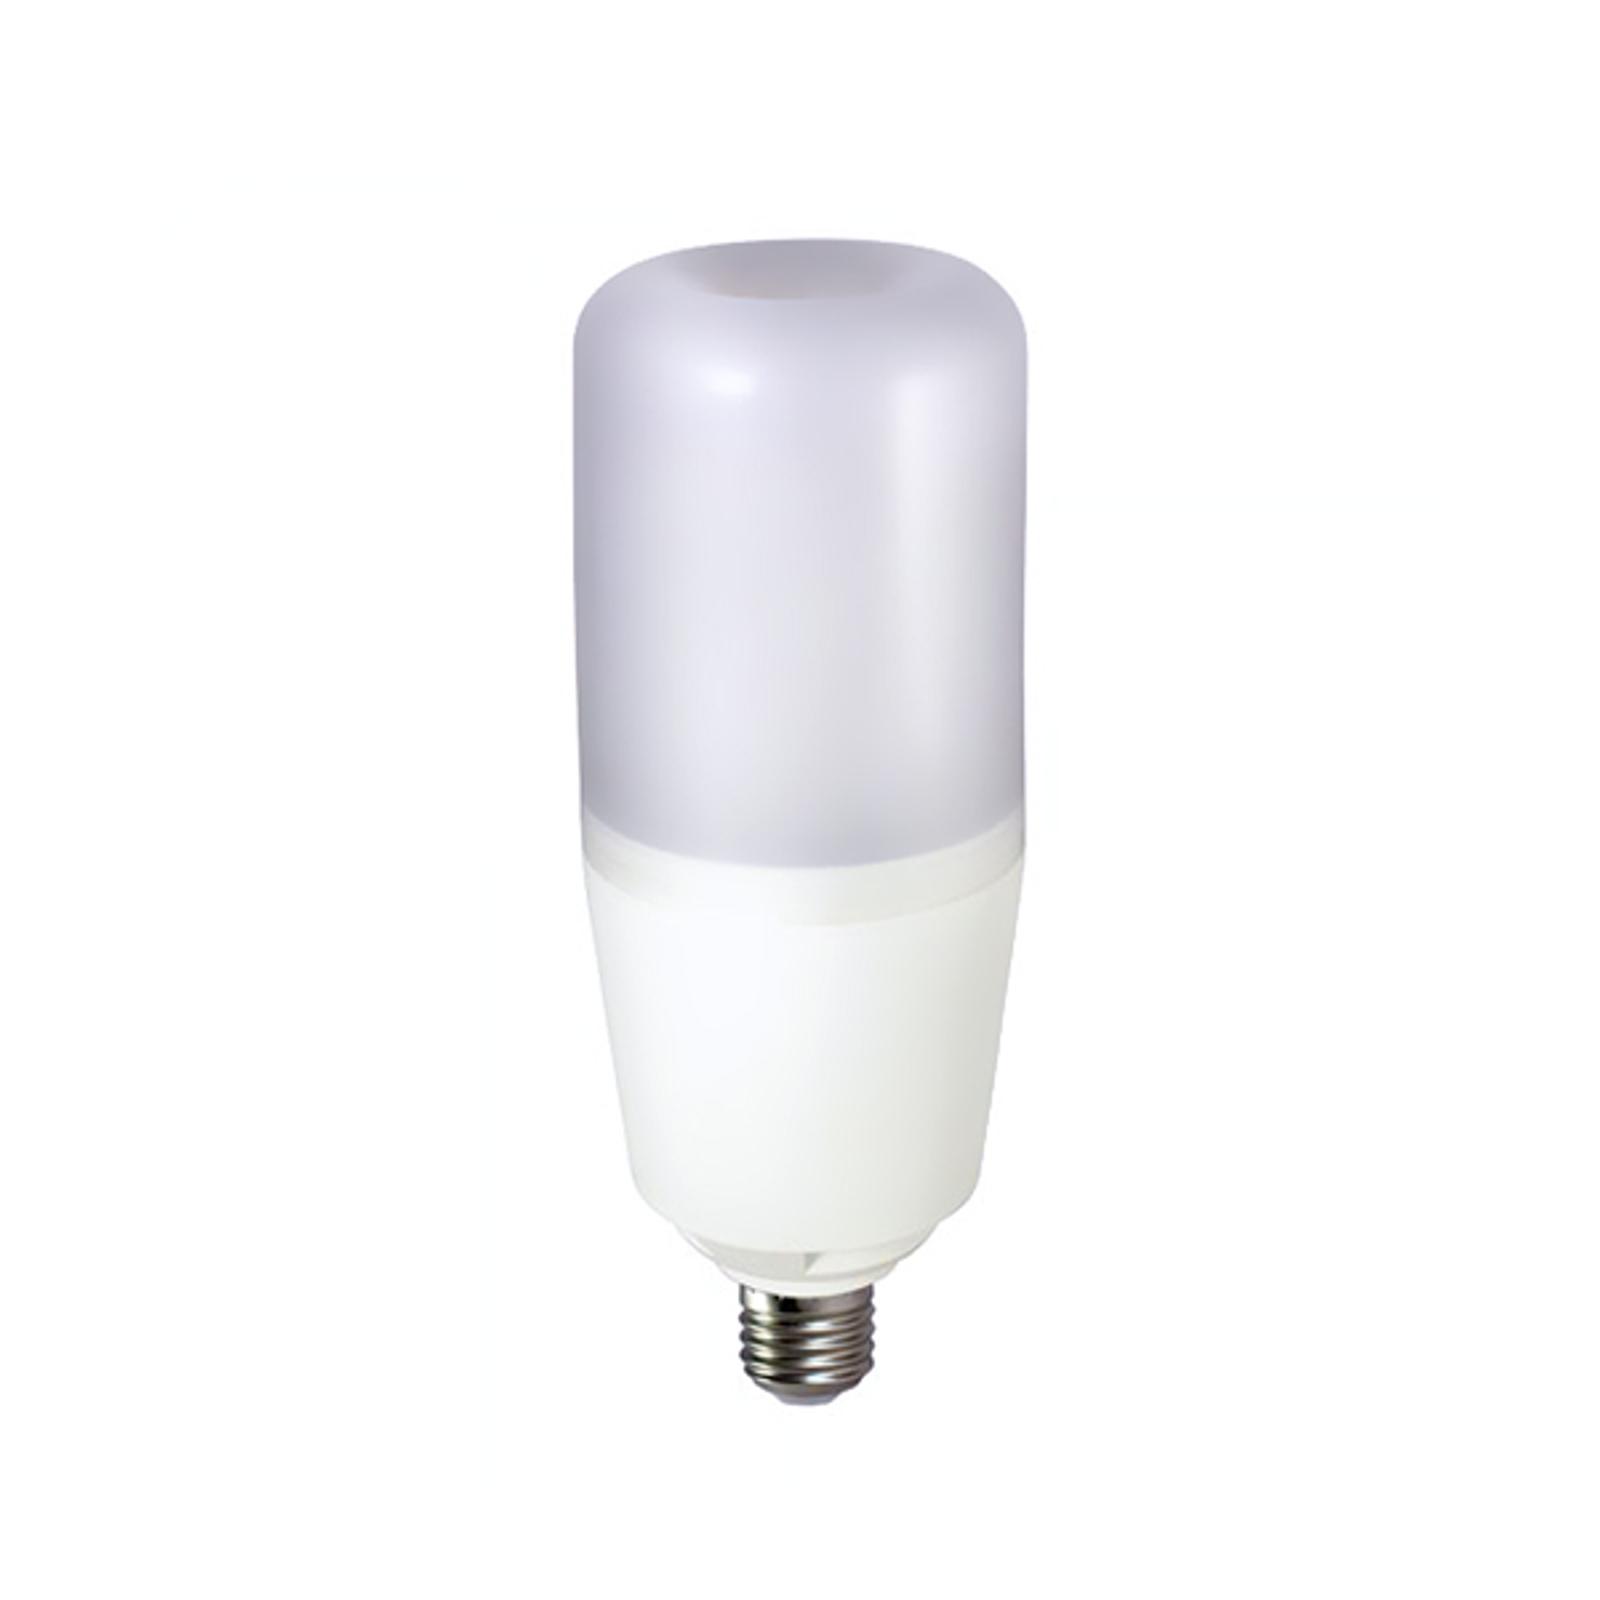 E27 30W 840 NUMO matt LED lamp, 218 mm_2515040_1